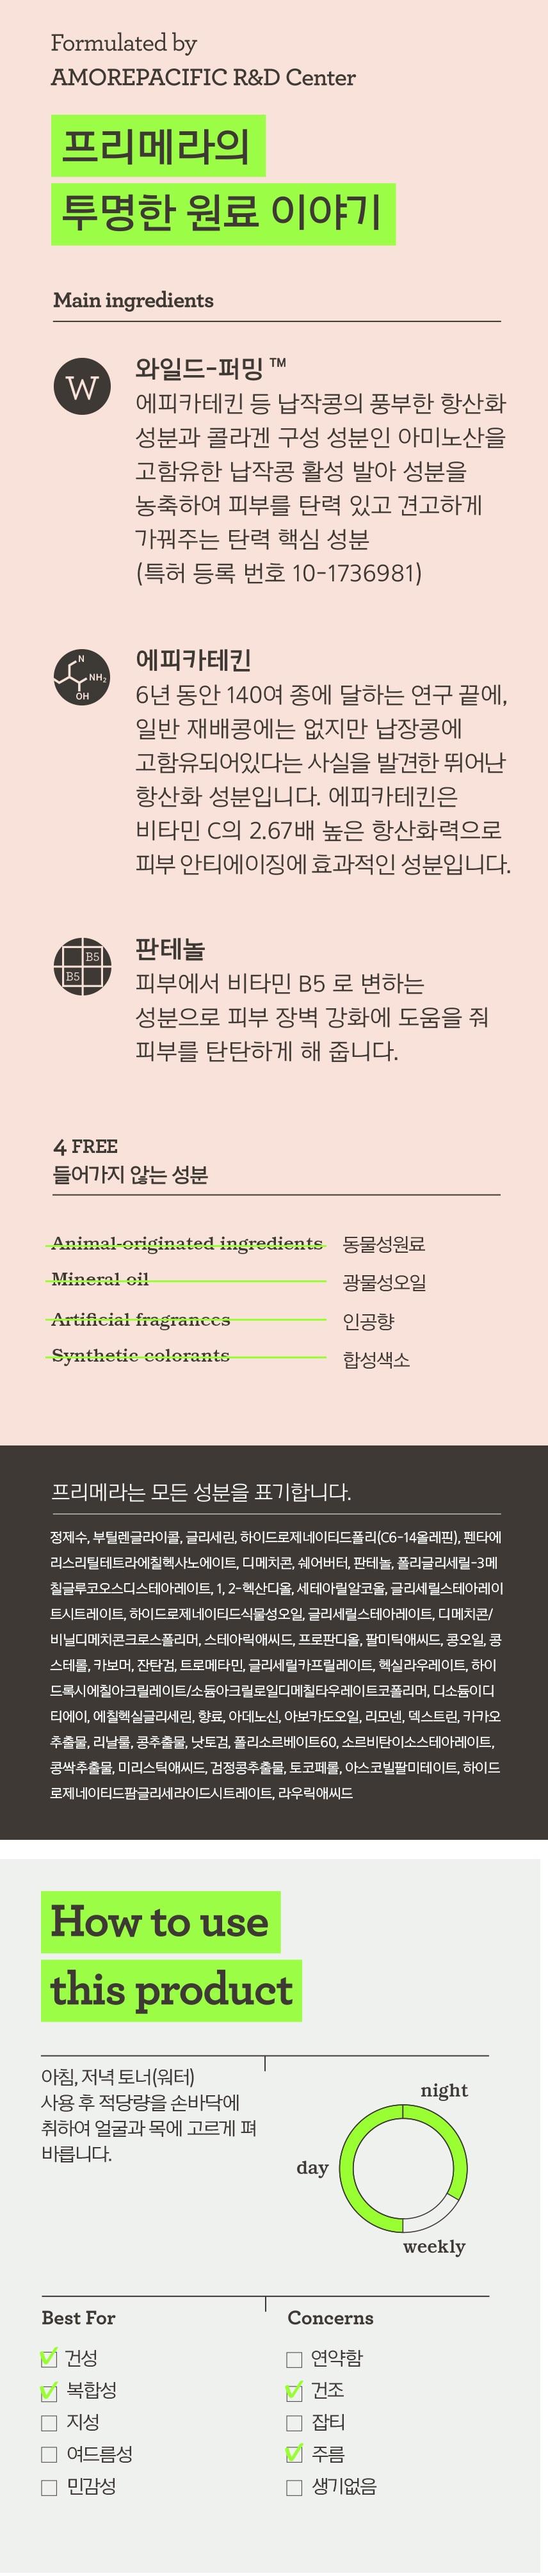 primera Wild Seed Firming Emulsion korean skincare prduct online shop malaysia sweden macau5